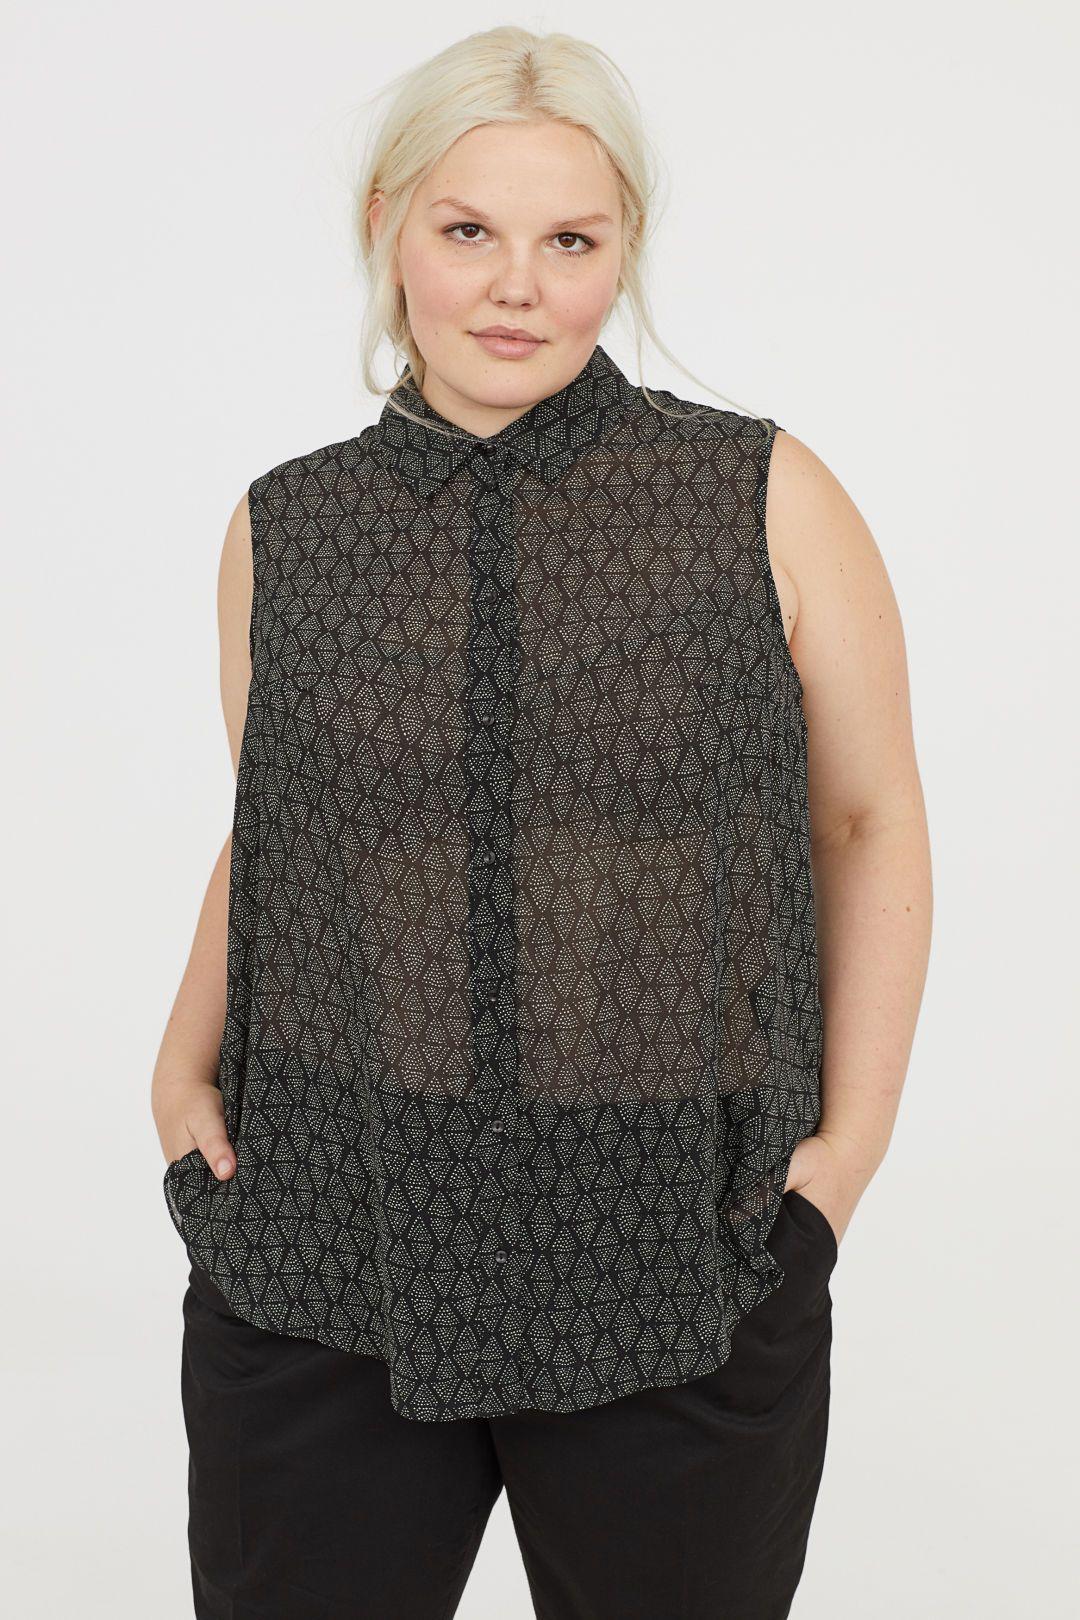 dd72f4e2f2aa4 H M+ Sleeveless Blouse - Black patterned - Ladies